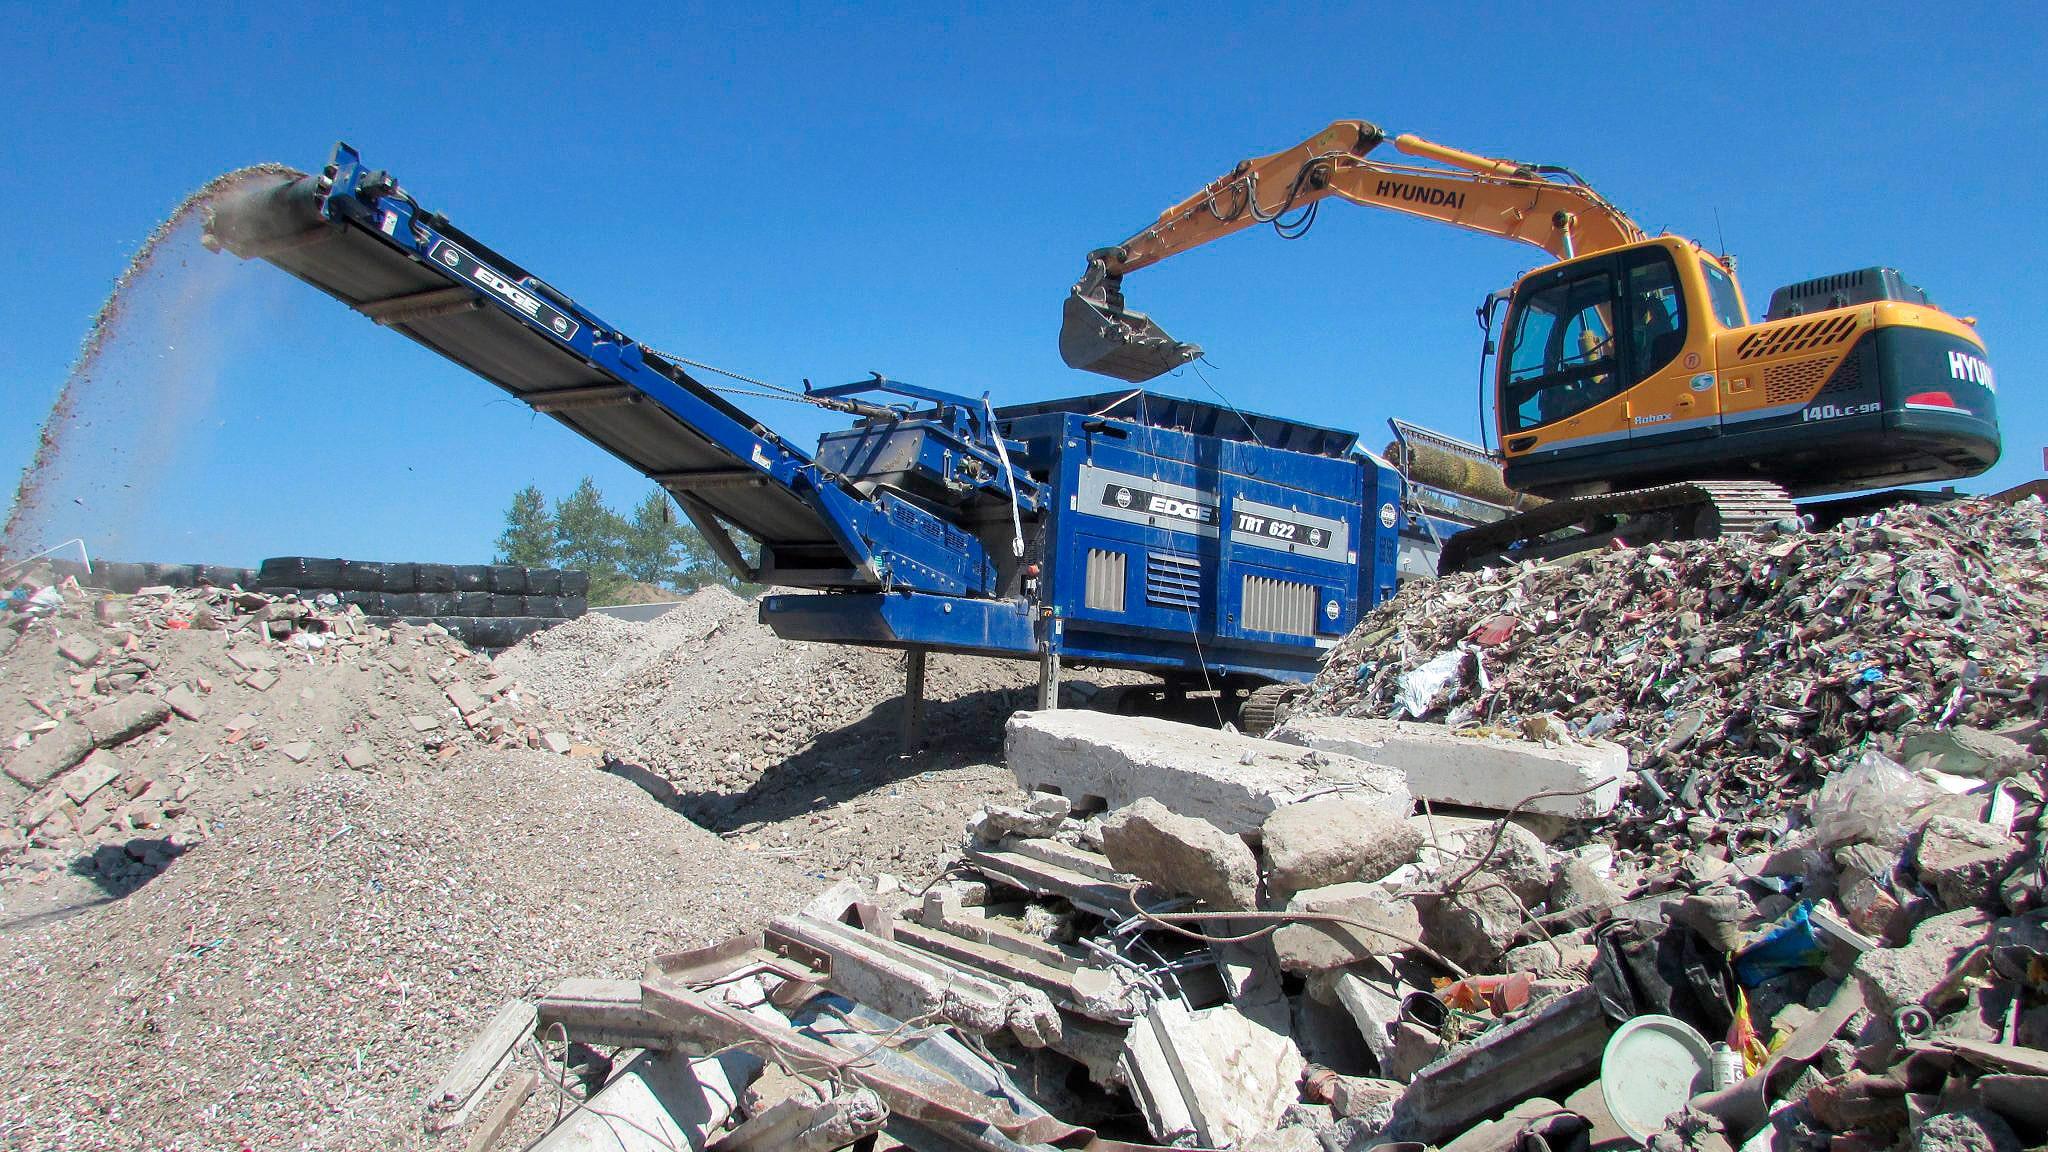 Dos agregados reciclados, o único que já é realidade é a brita a partir de resíduos de concreto armado demolido Crédito: Banco de Imagens